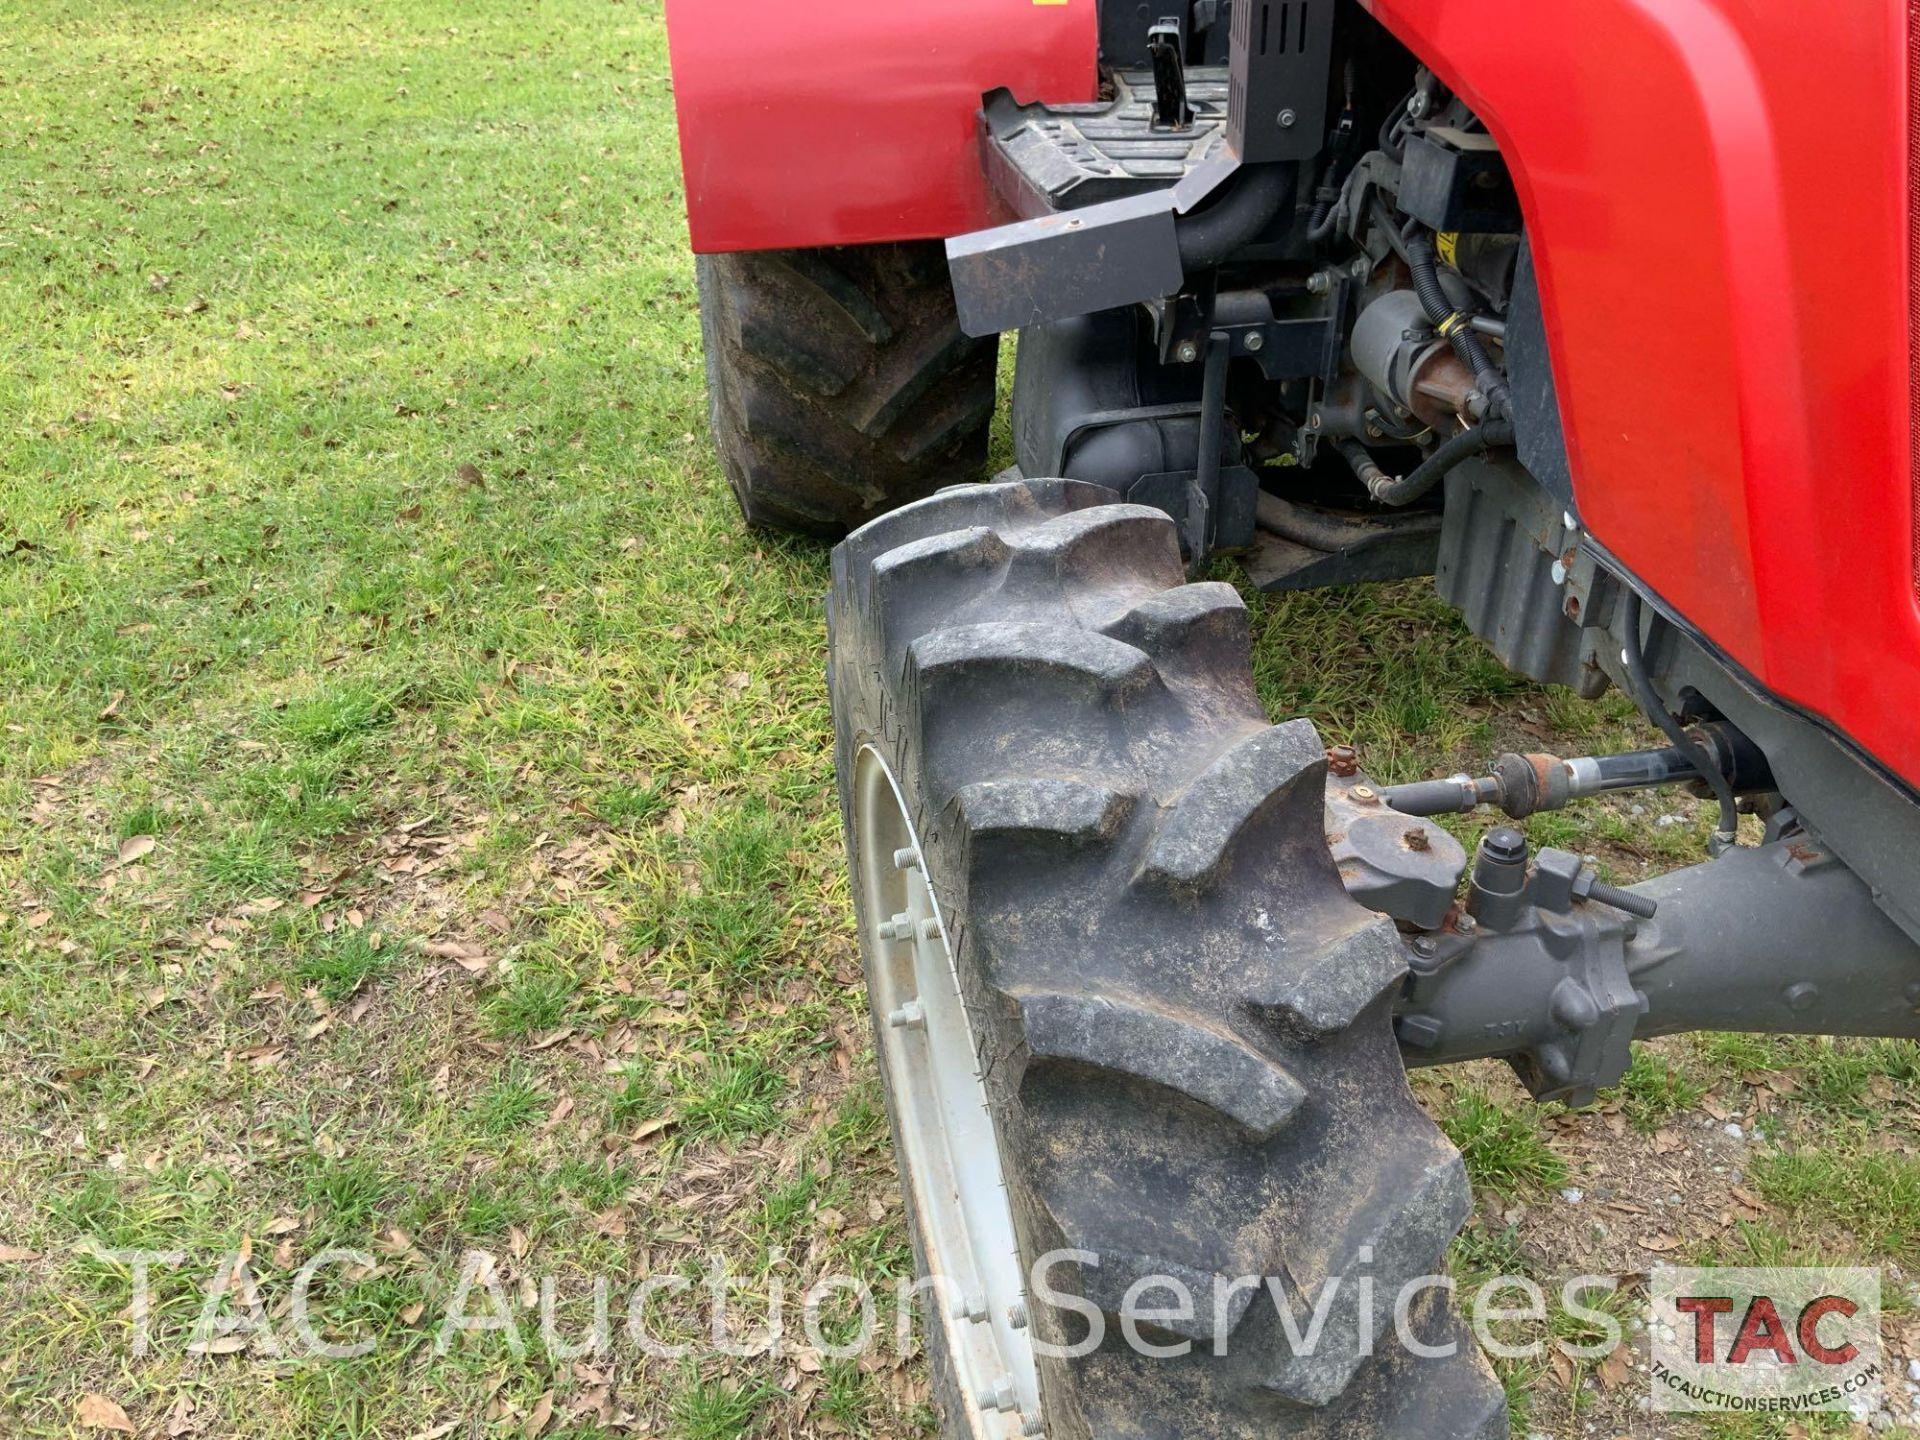 Massey-Ferguson 4610LP Farm Tractor - Image 24 of 26